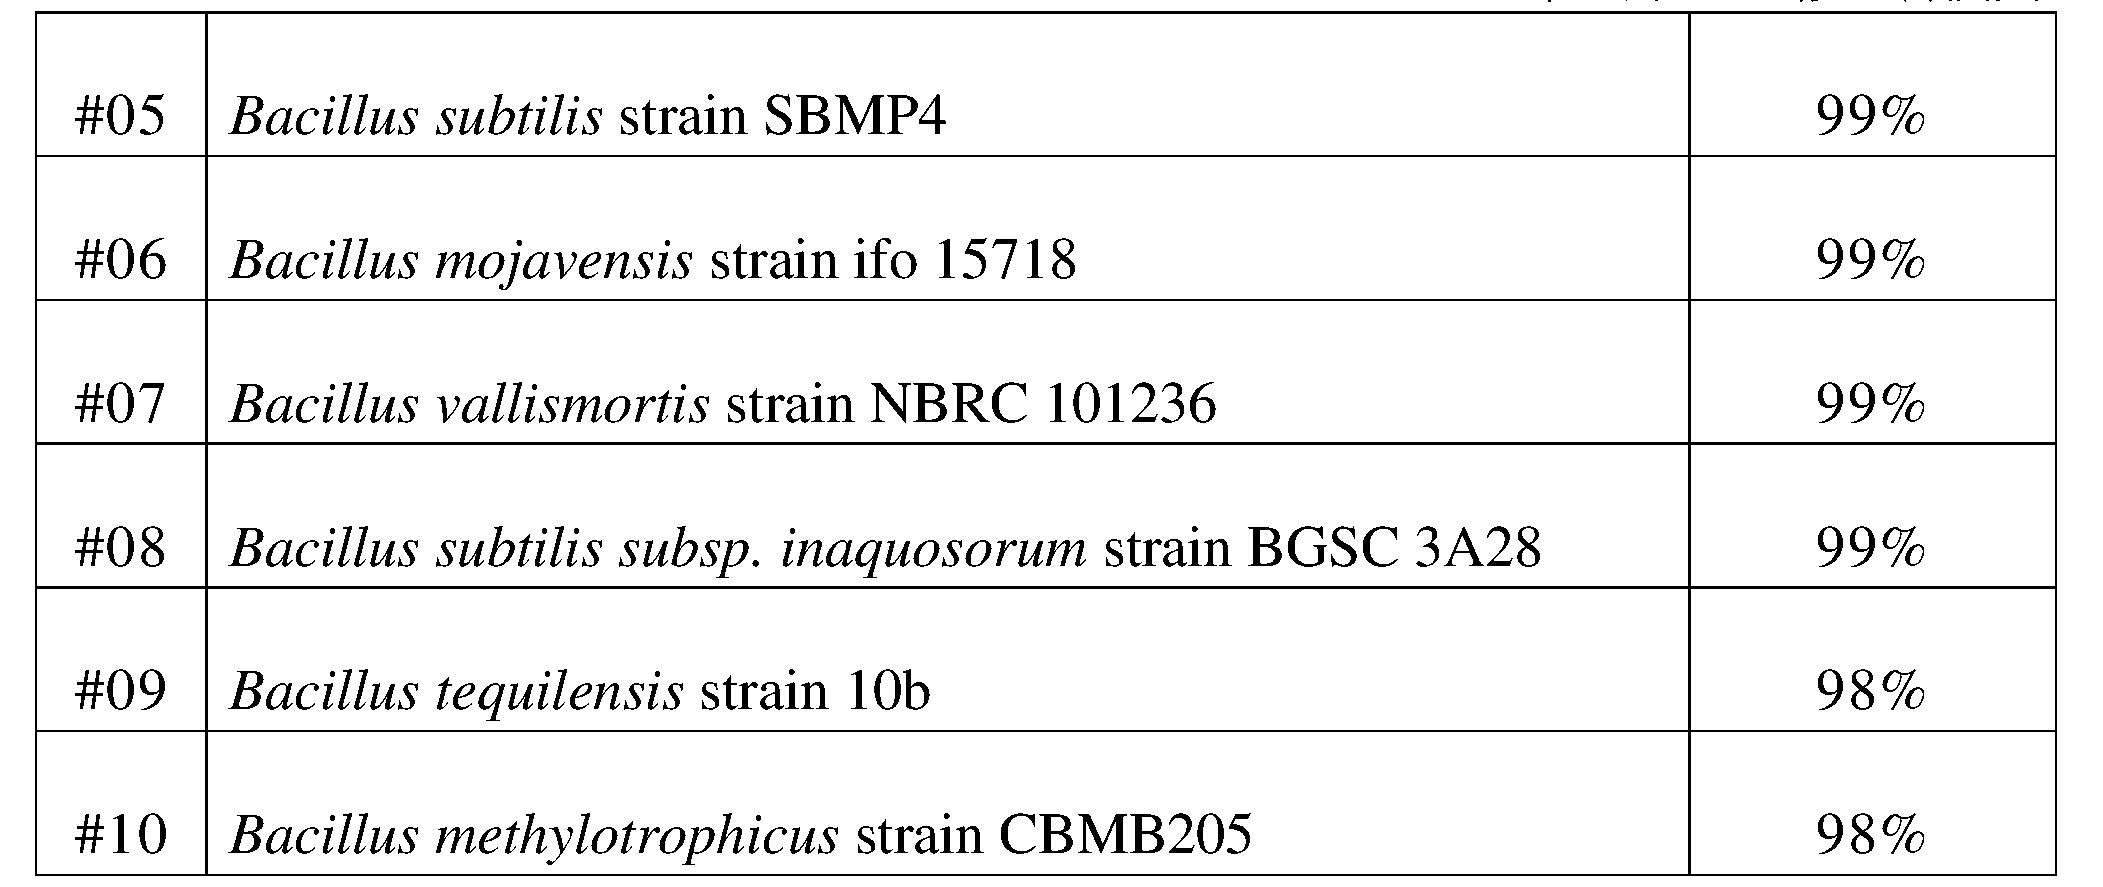 Figure 107145475-A0305-02-0007-5